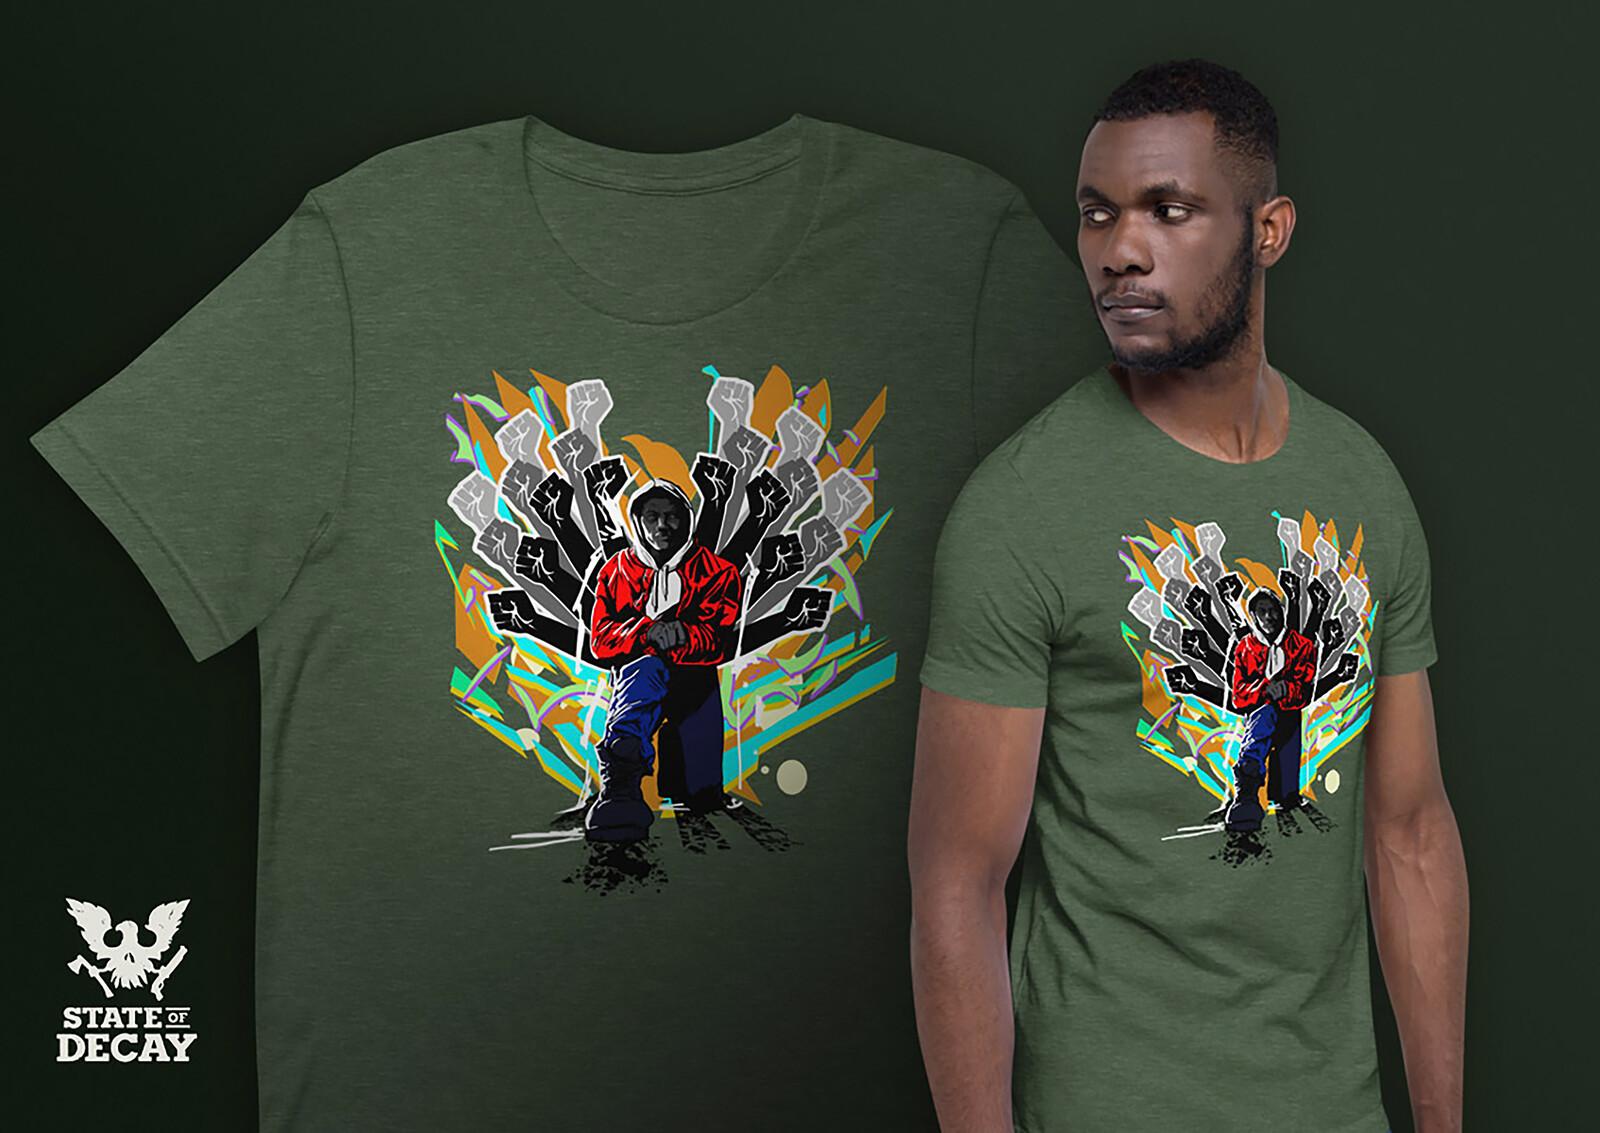 Final Tshirt design